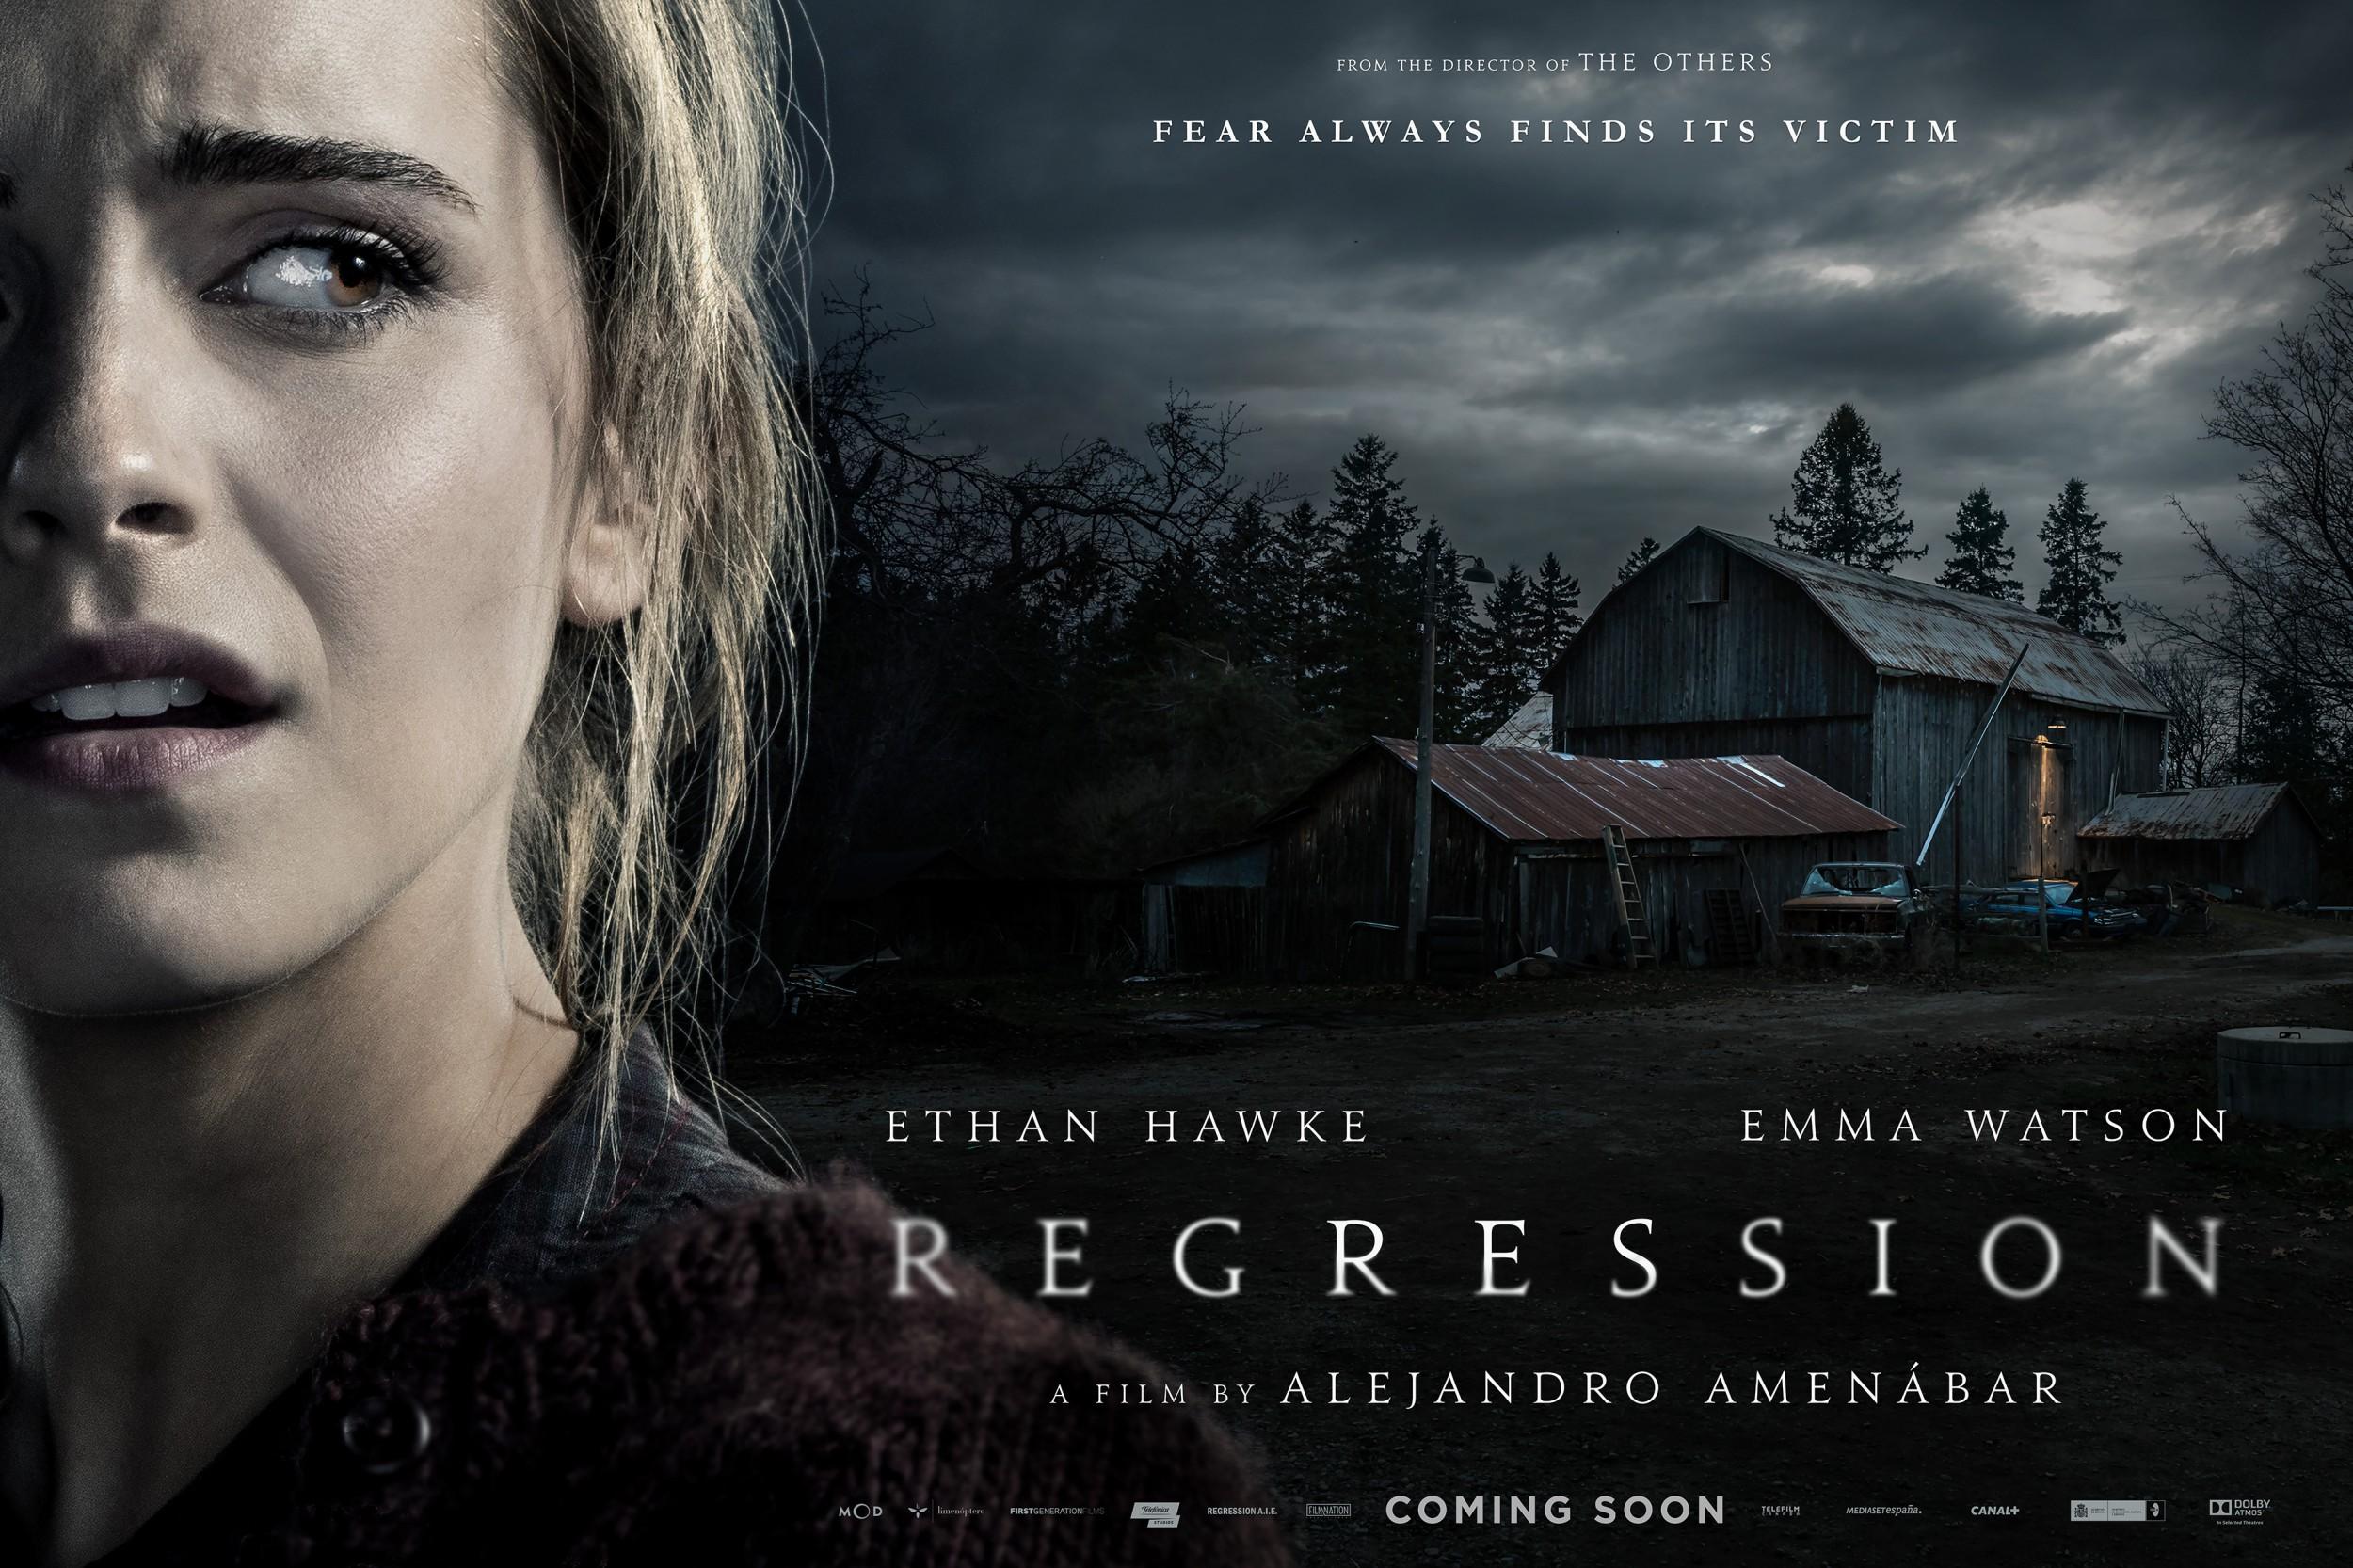 Regression film poster 2015